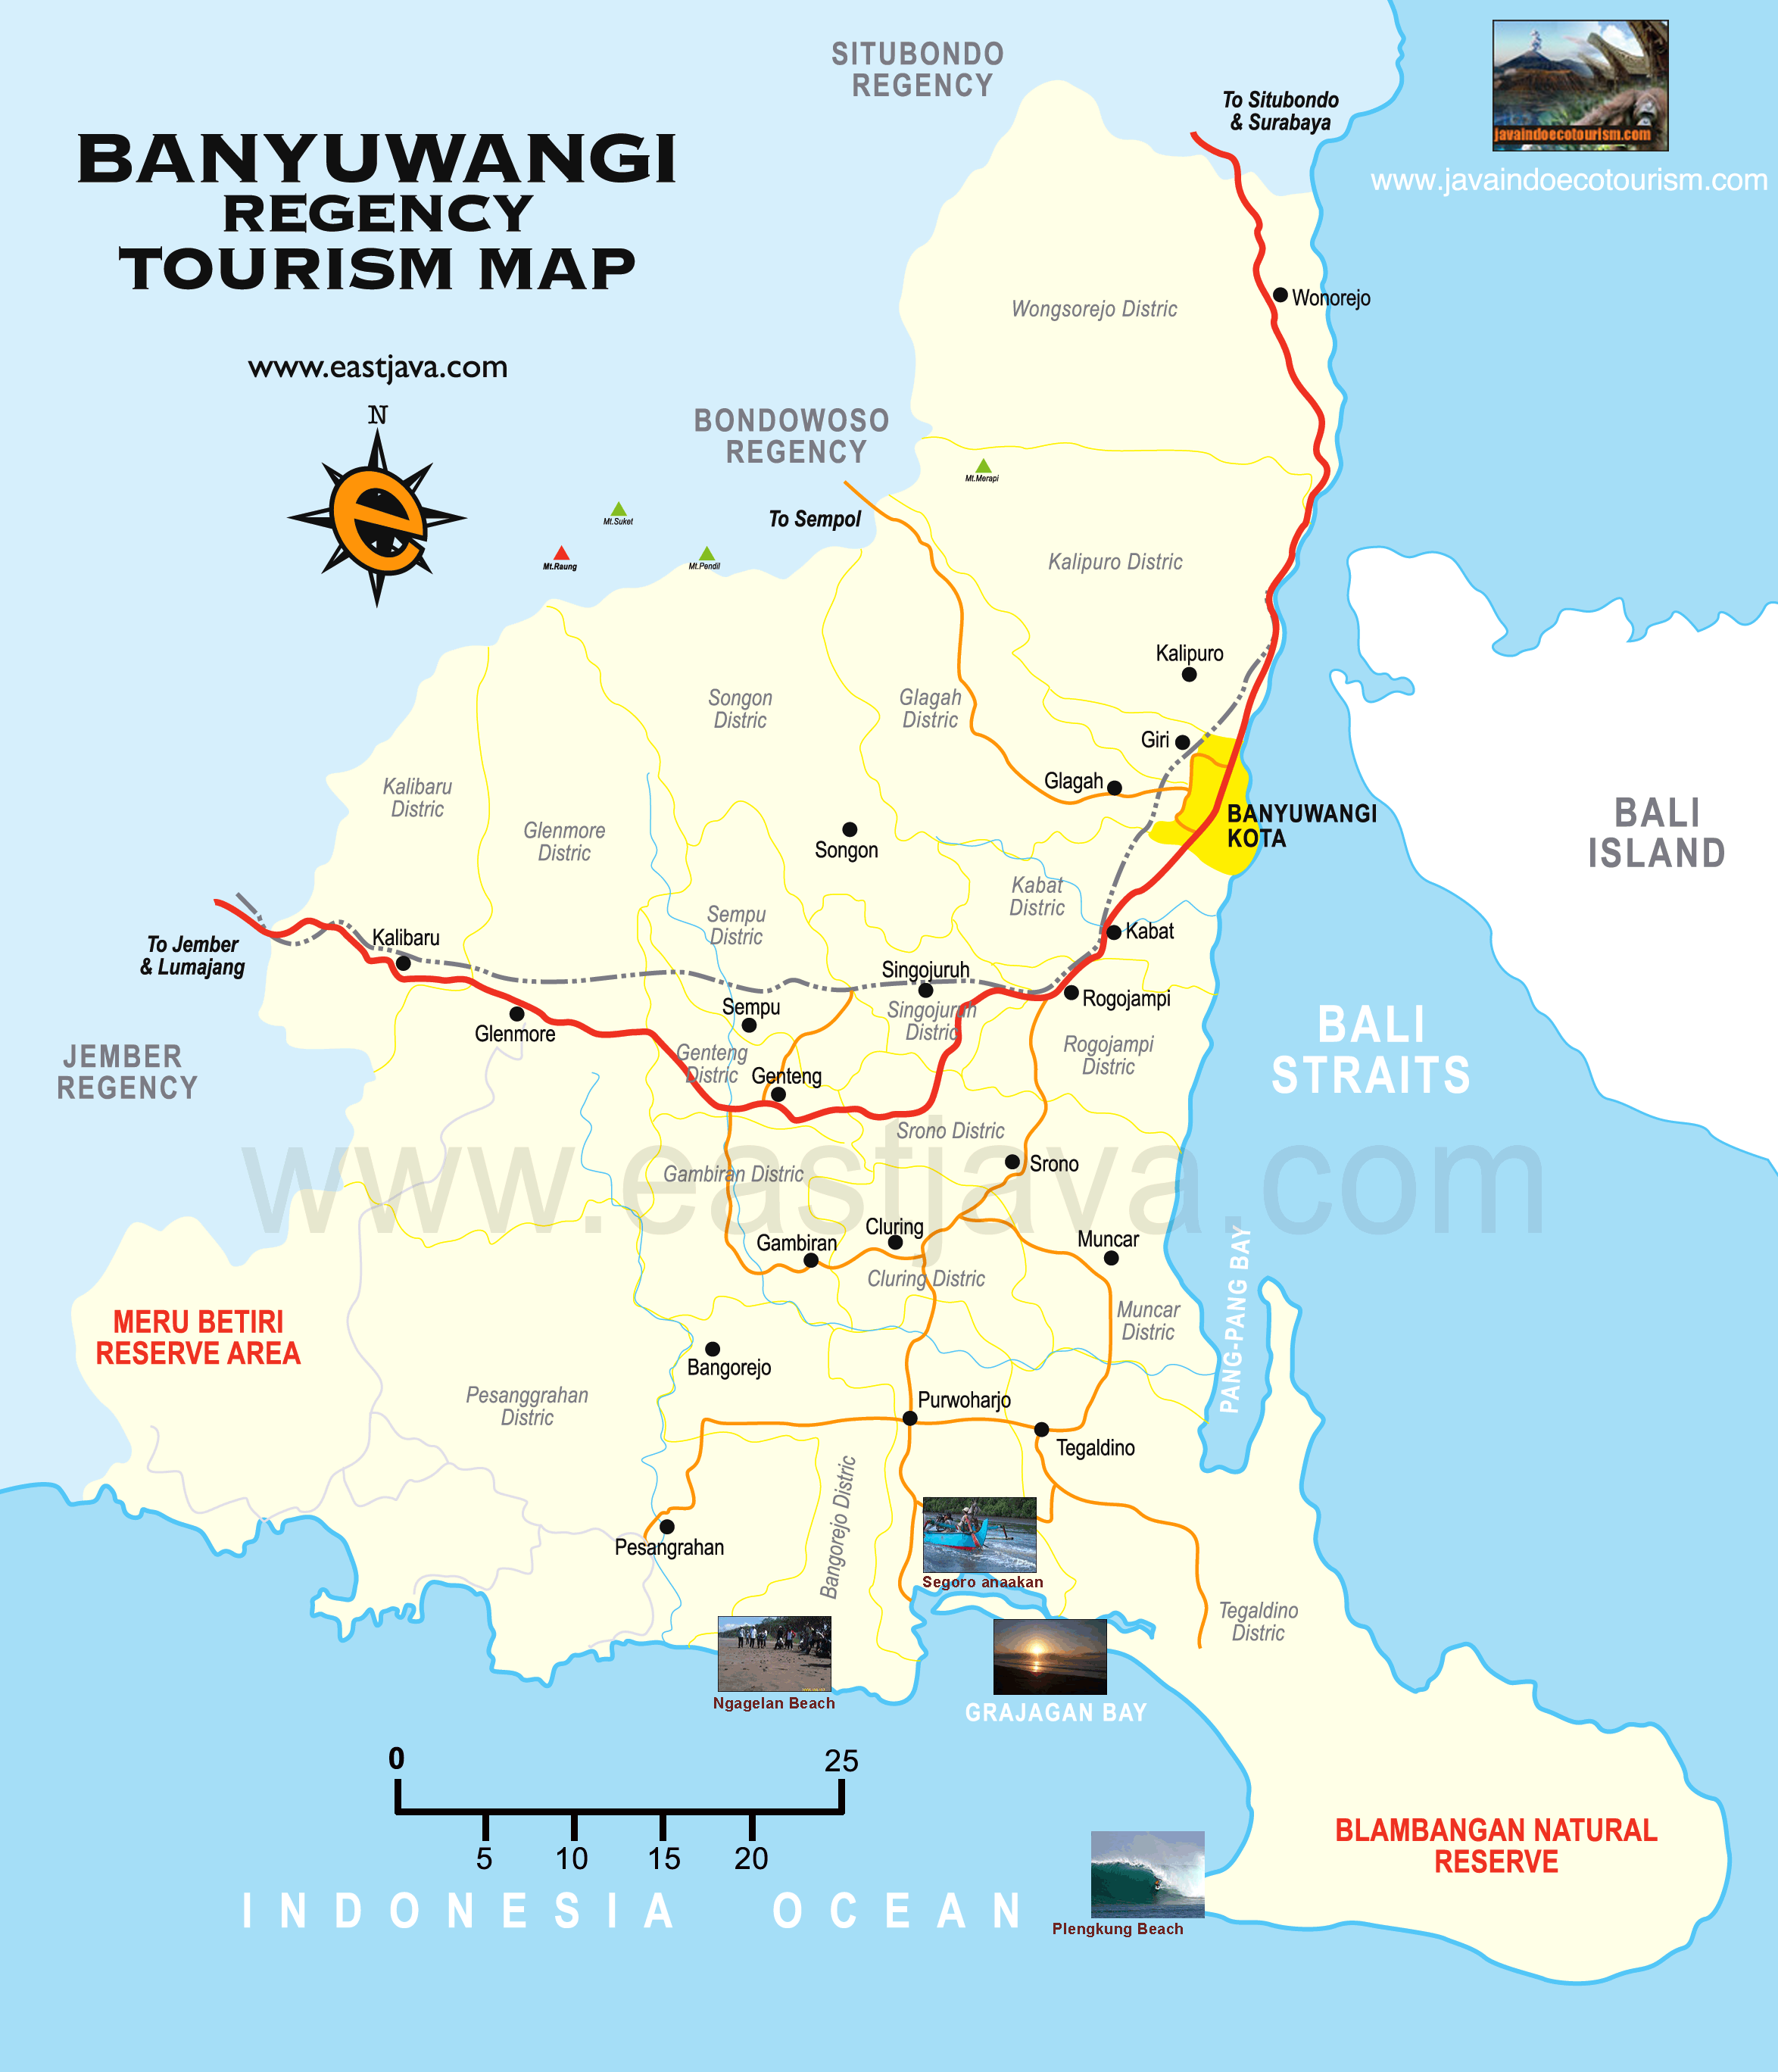 Peta Wisata Banyuwangi Jawa Timur Dapatkan Lengkap Tourism Map Pantai